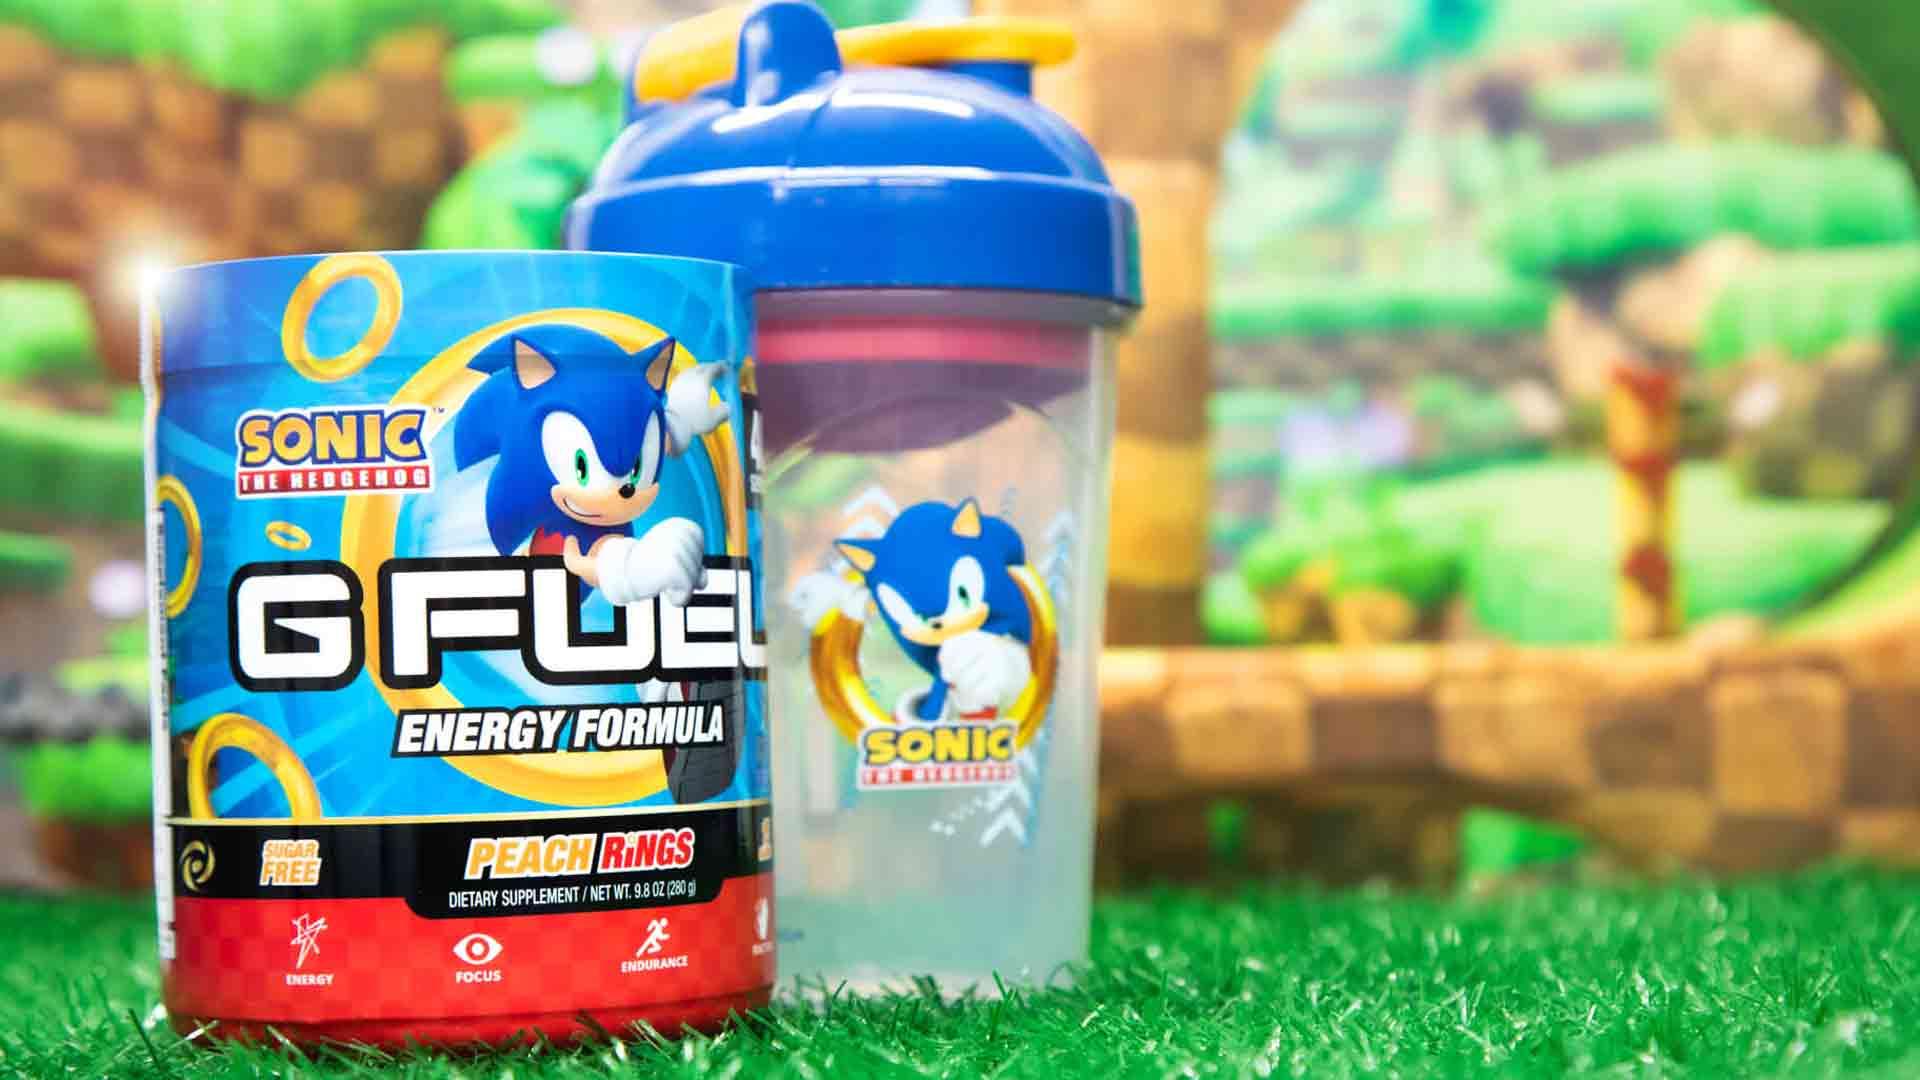 G Fuel Sonic Peach Rings